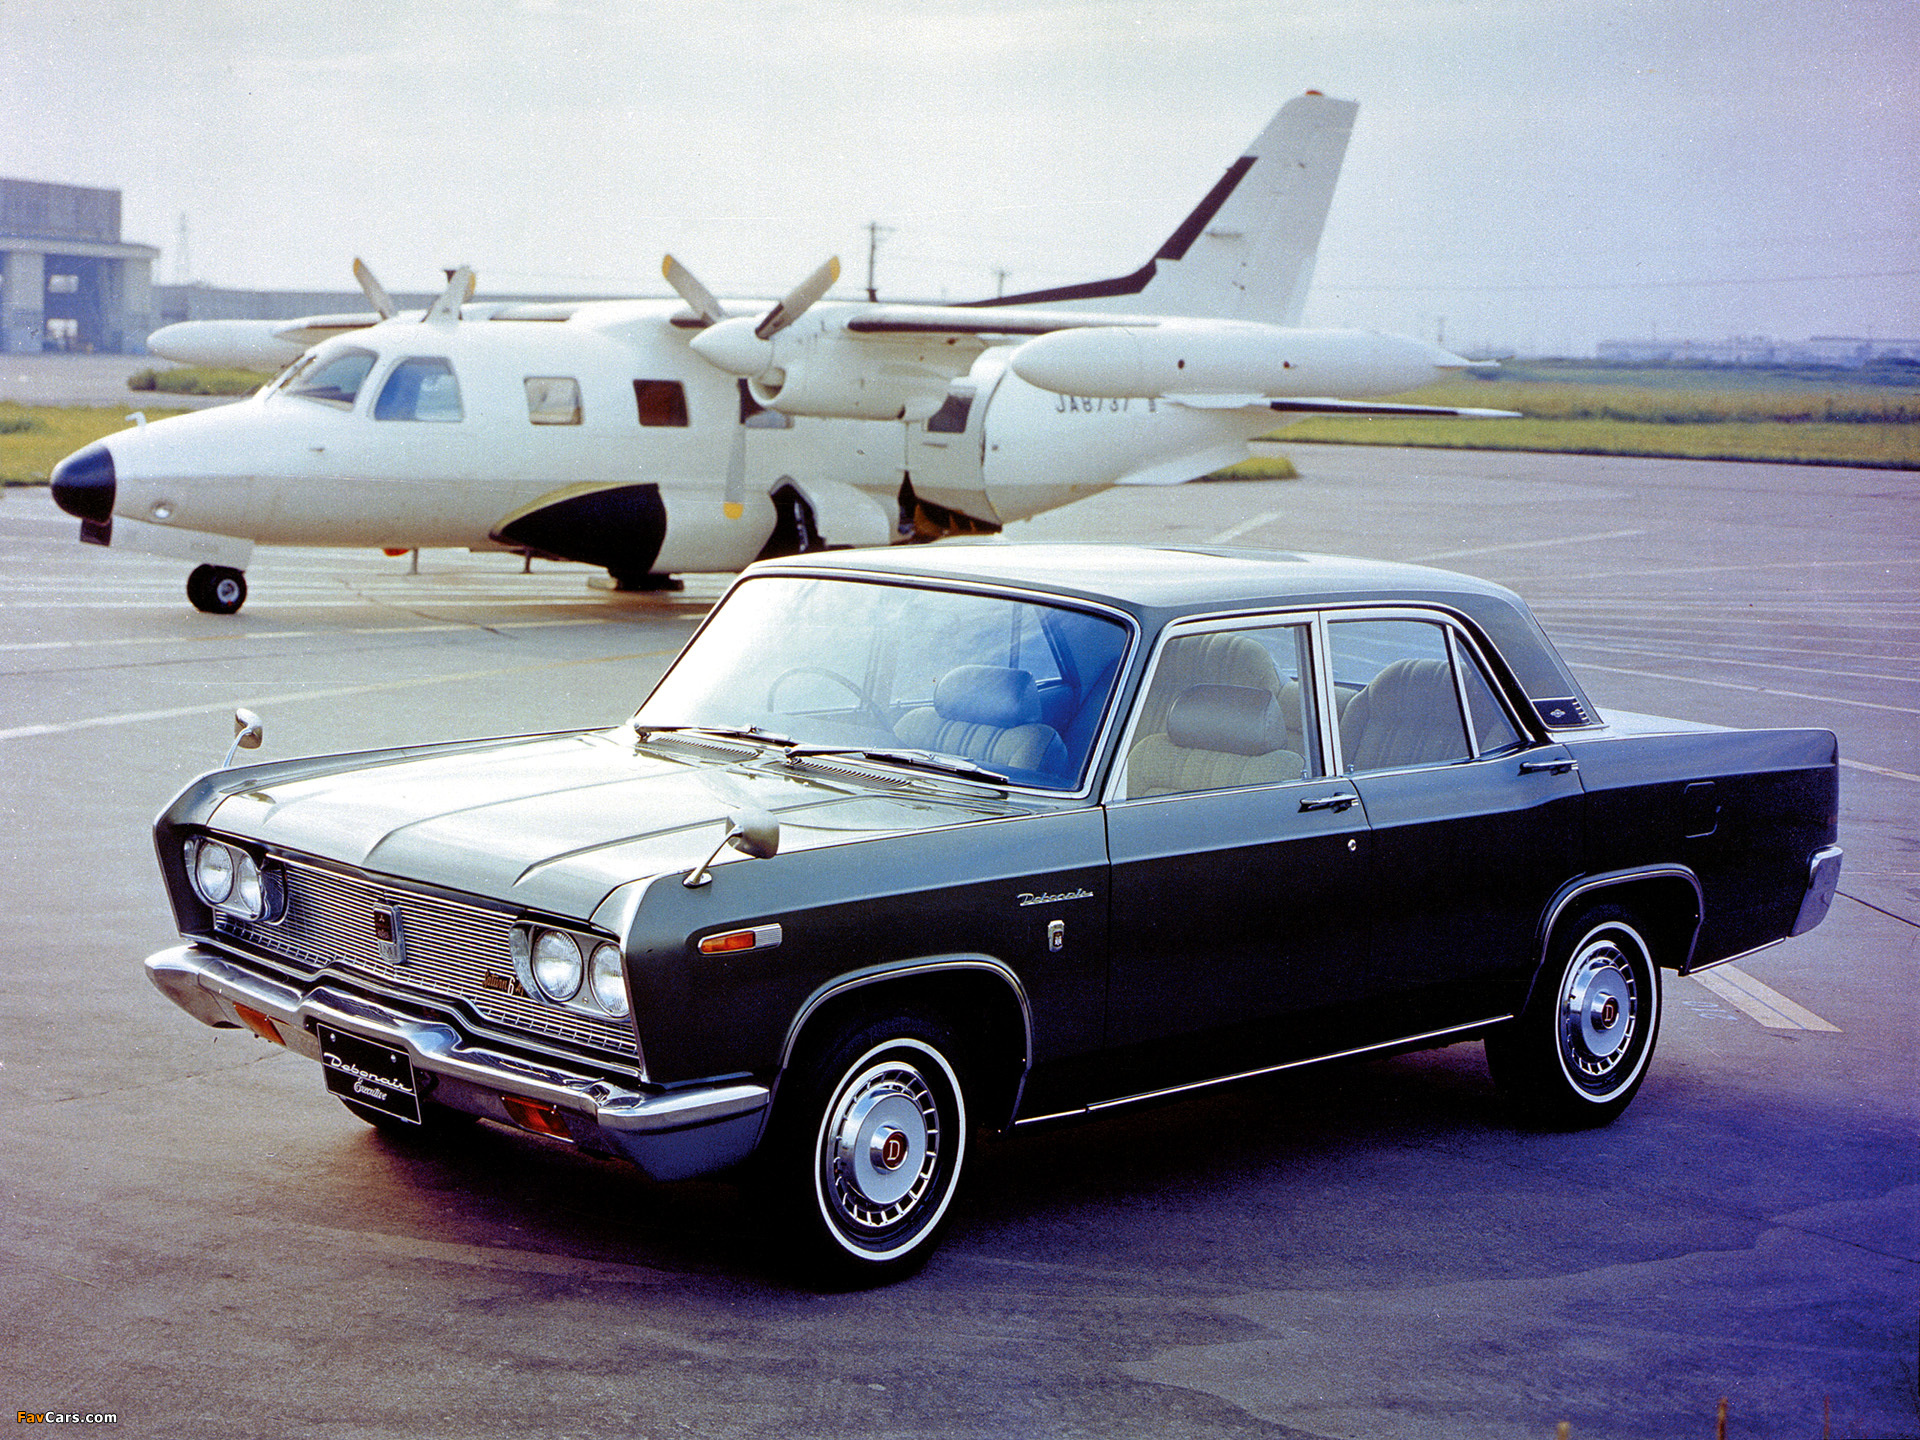 Mitsubishi Debonair » Find Cars in Your City